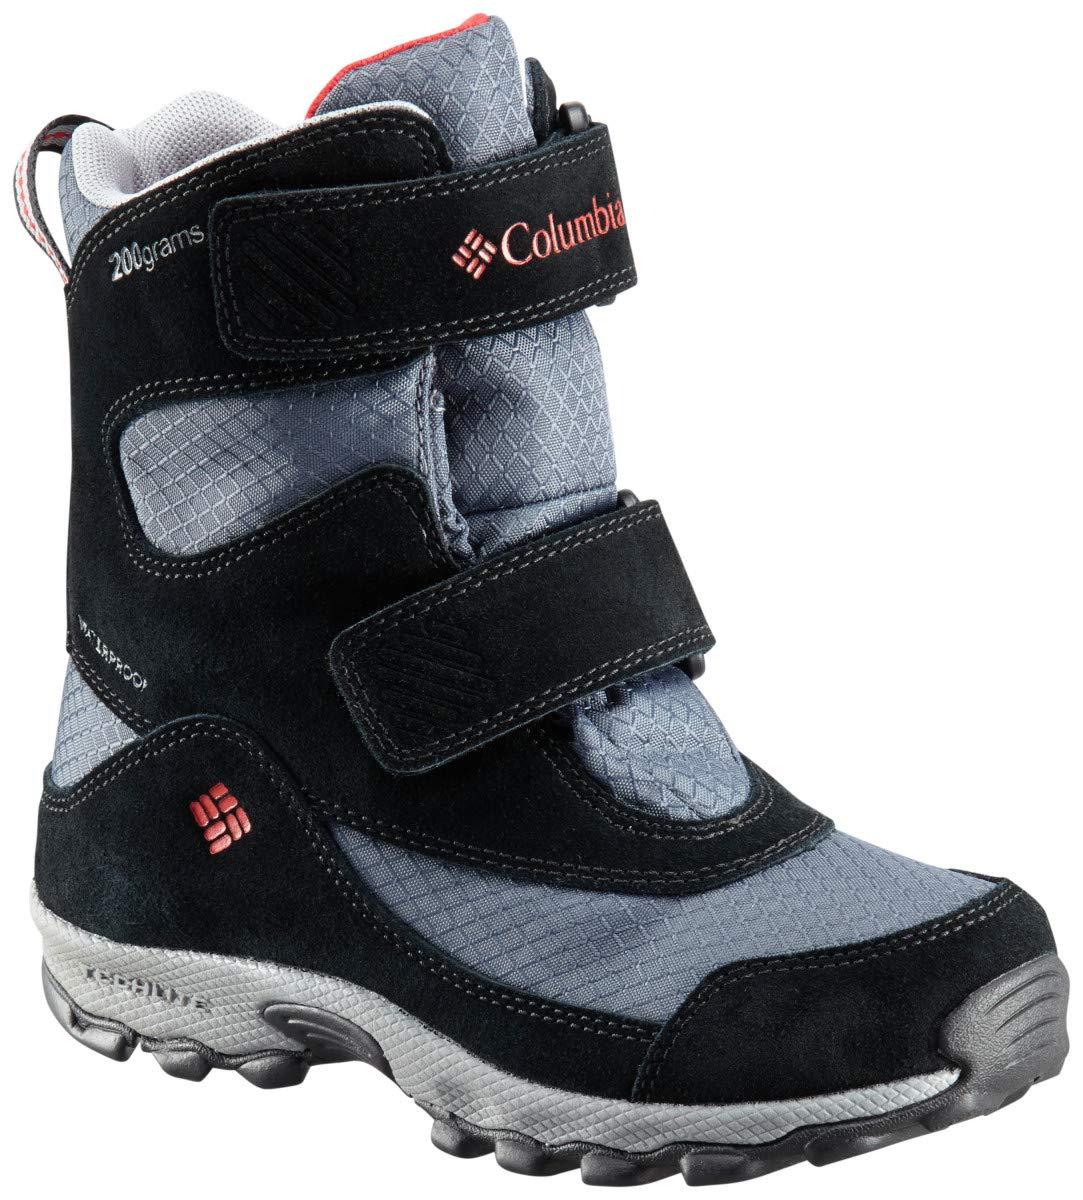 Columbia Boys' Youth Parkers Peak Velcro Waterproof Winter Boot Snow, Graphite, Bright red, 7 Regular US Big Kid